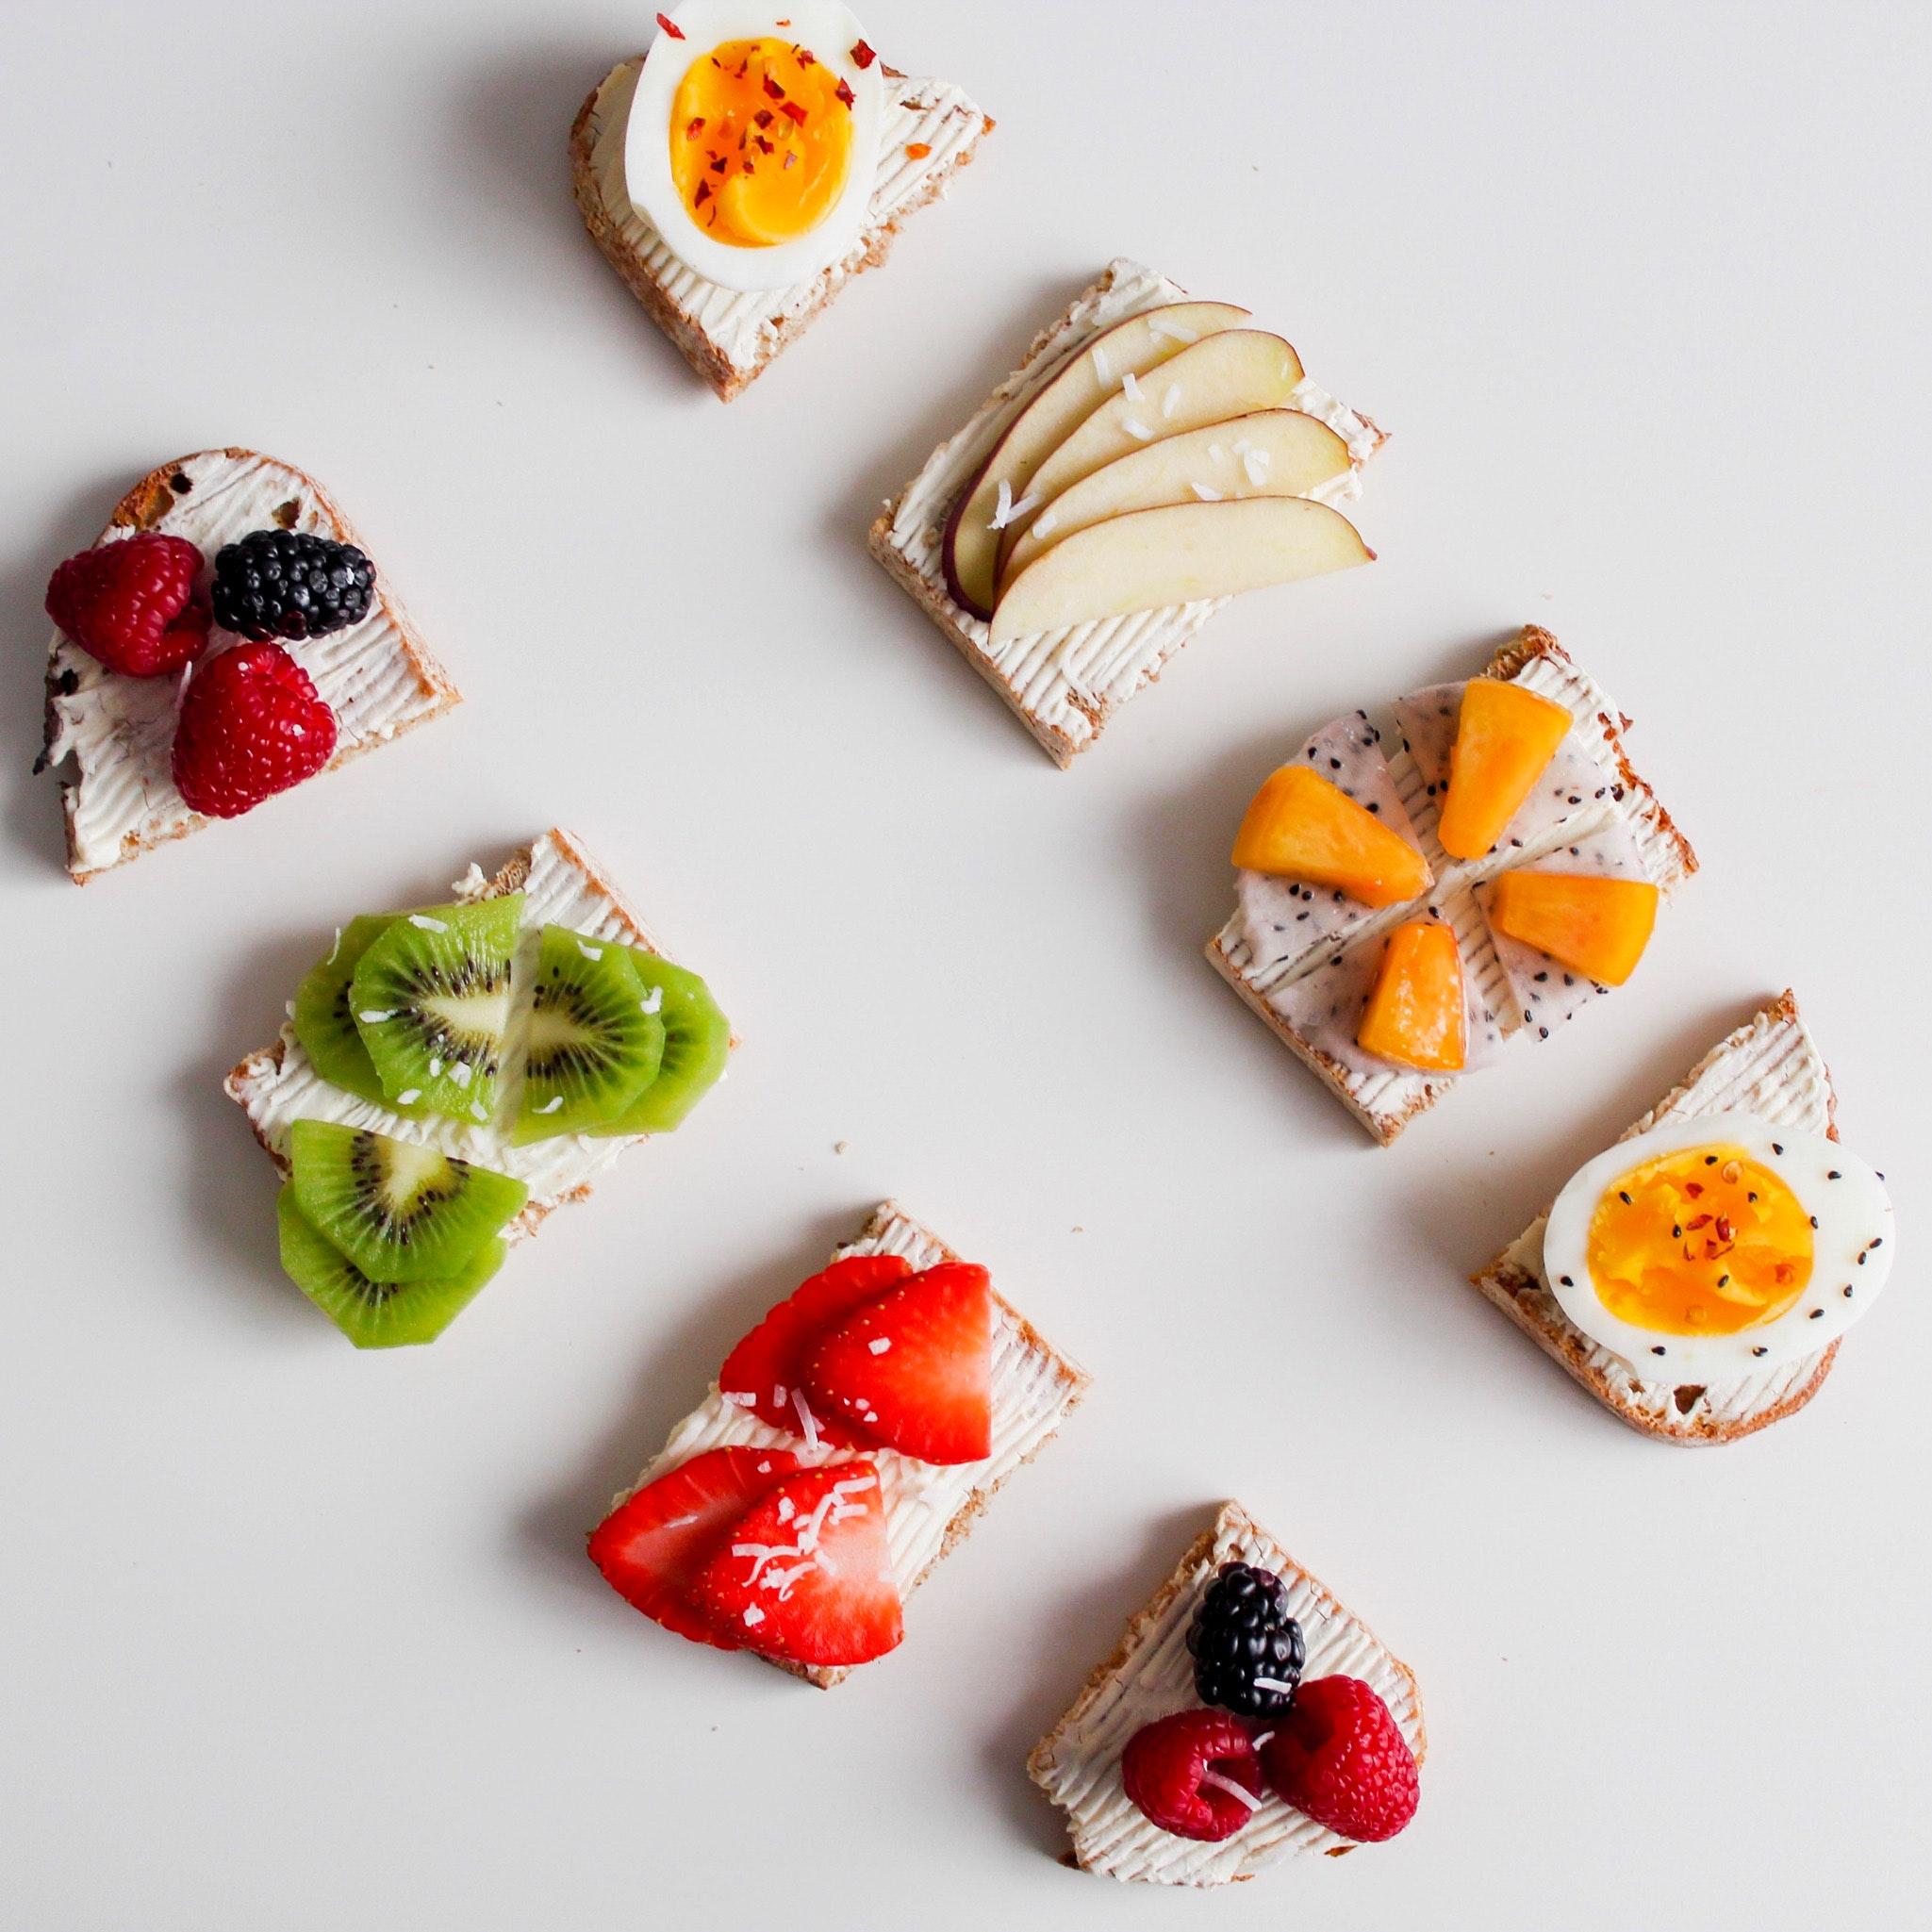 berries-breakfast-brunch-892649.jpg